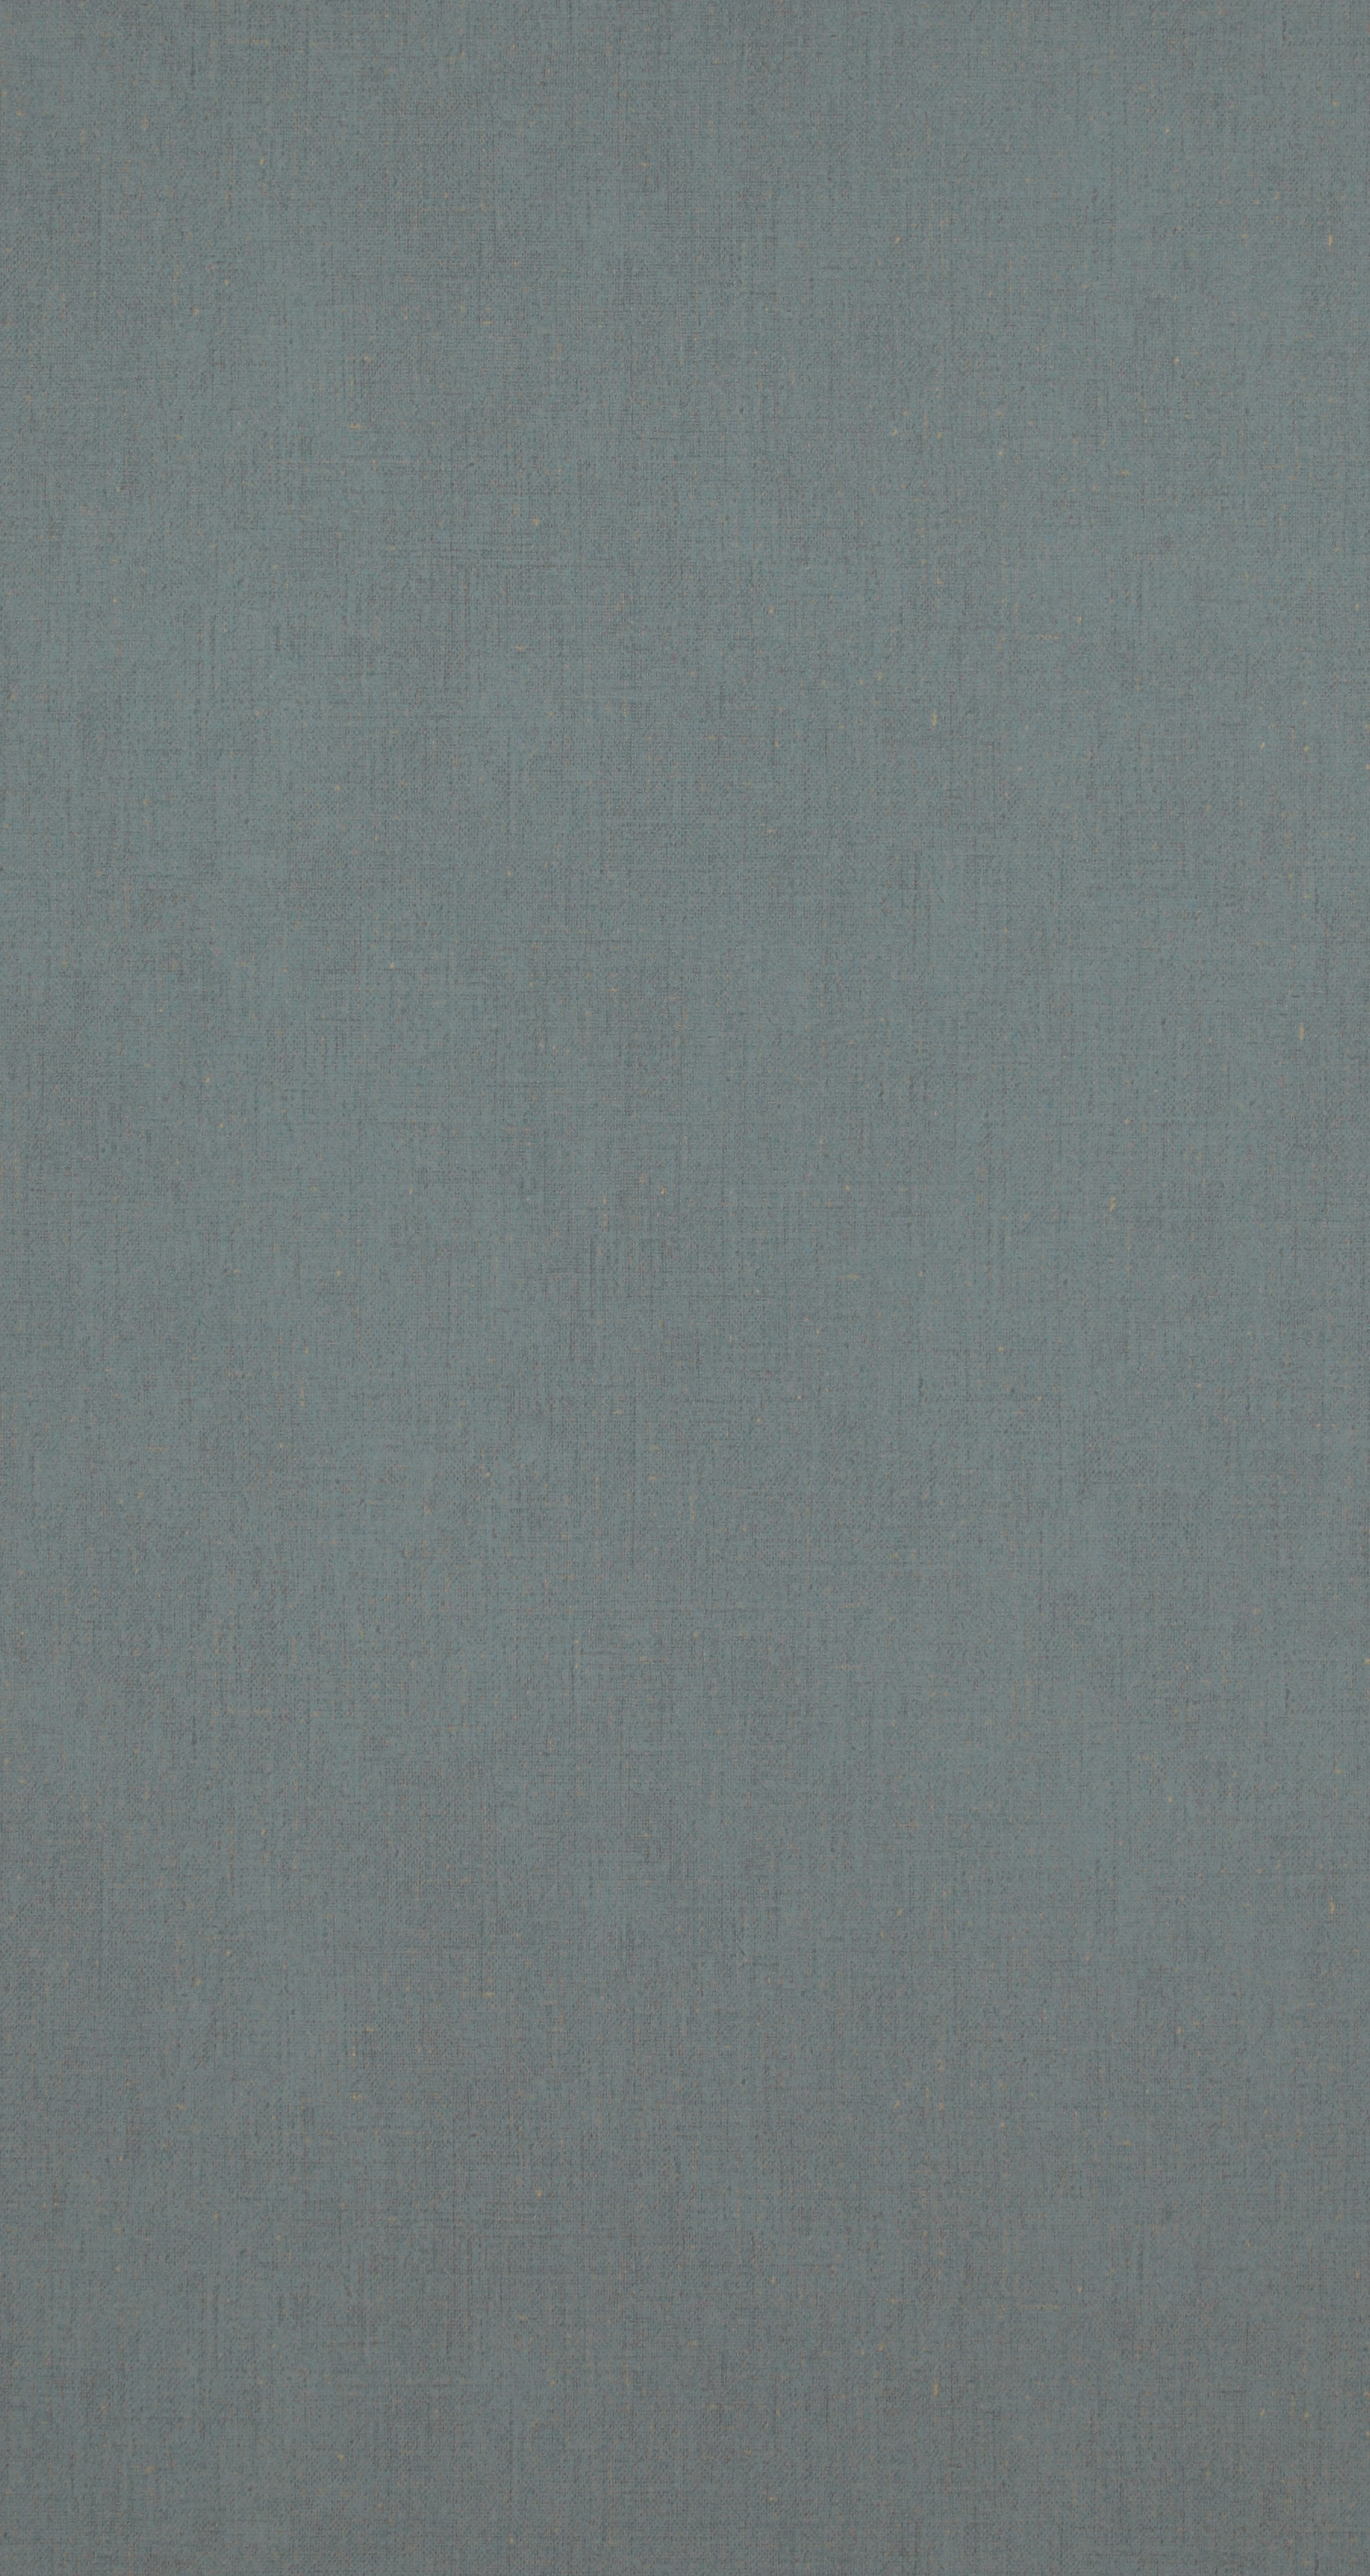 Обои  BN International,  коллекция Chacran II, артикул18400